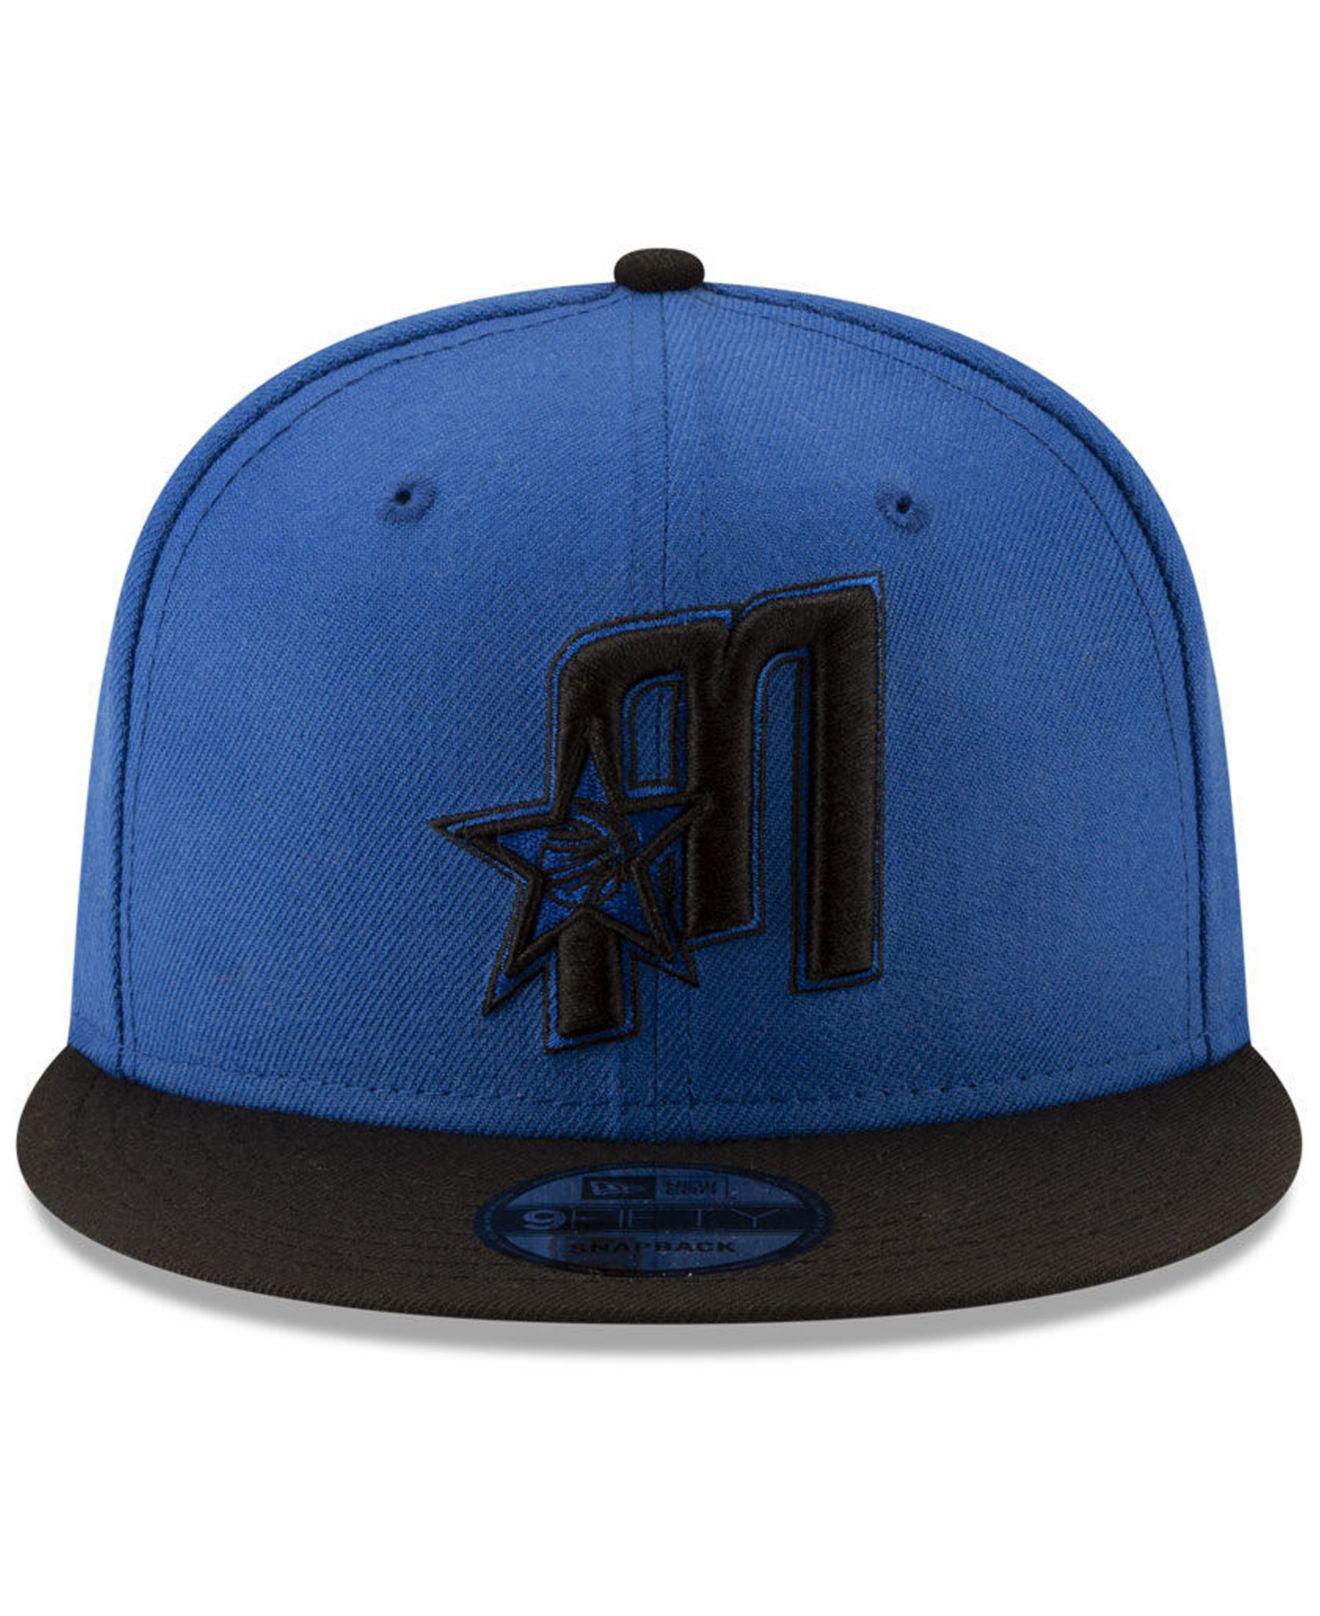 size 40 86f01 546db Lyst - KTZ Orlando Magic Light City Combo 9fifty Snapback Cap in Blue for  Men